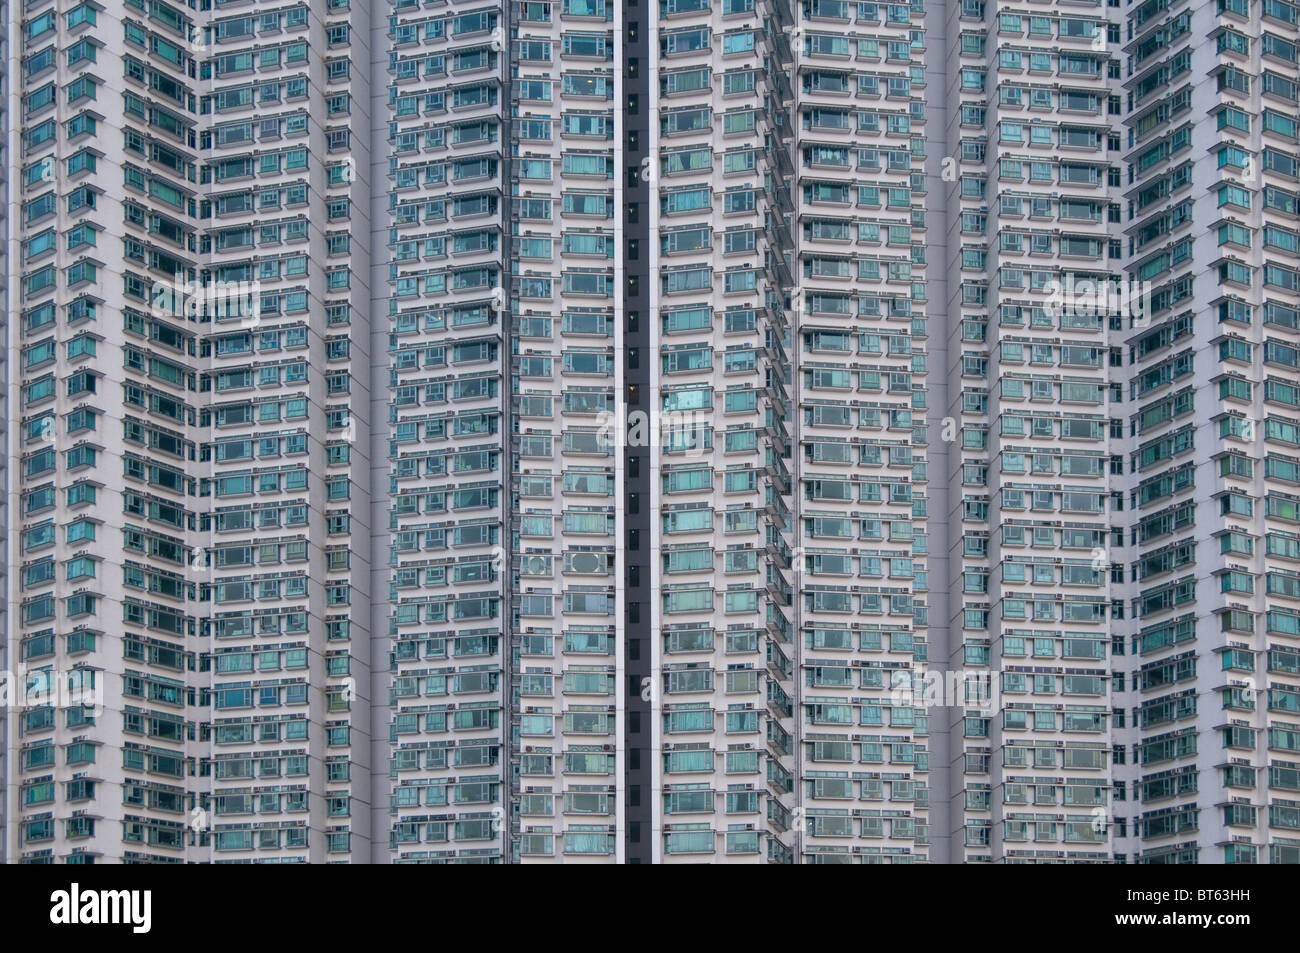 tower block high rise tung chung Kin  Road, Hong Kong sky scraper caribbean coast housing development overlooking - Stock Image